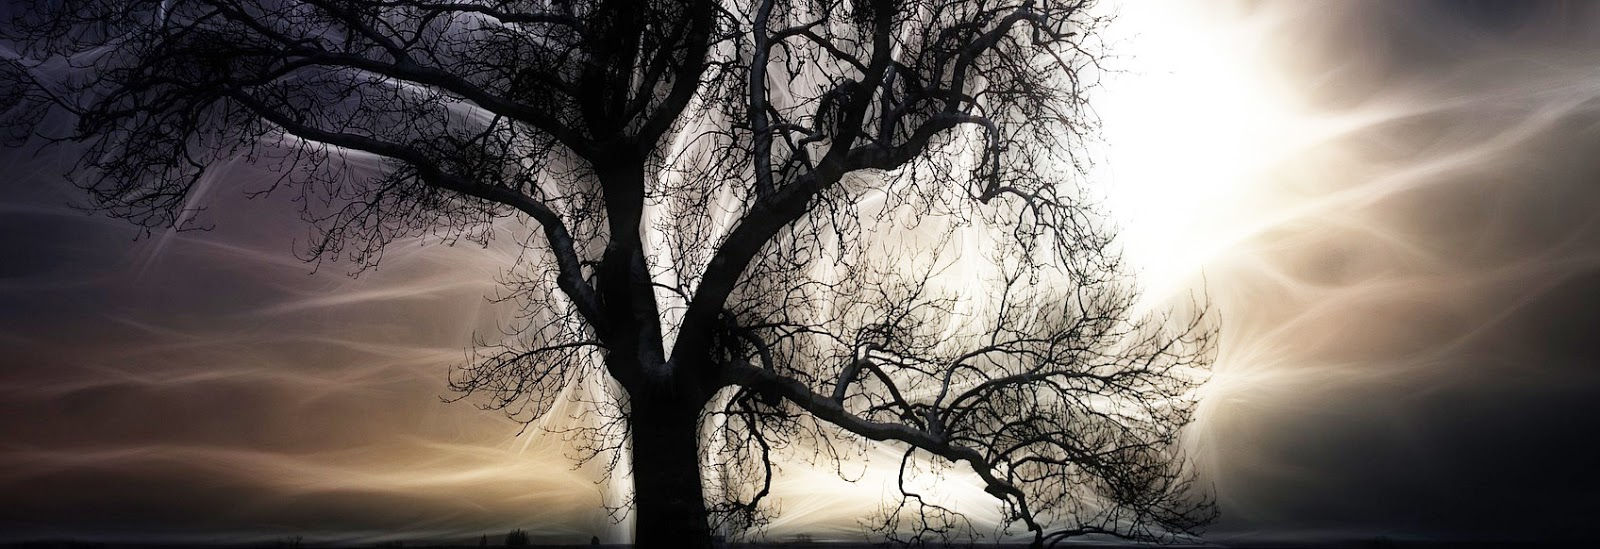 Magical Agust Night Under Giant Oak >> Sofia Karin Axelsson